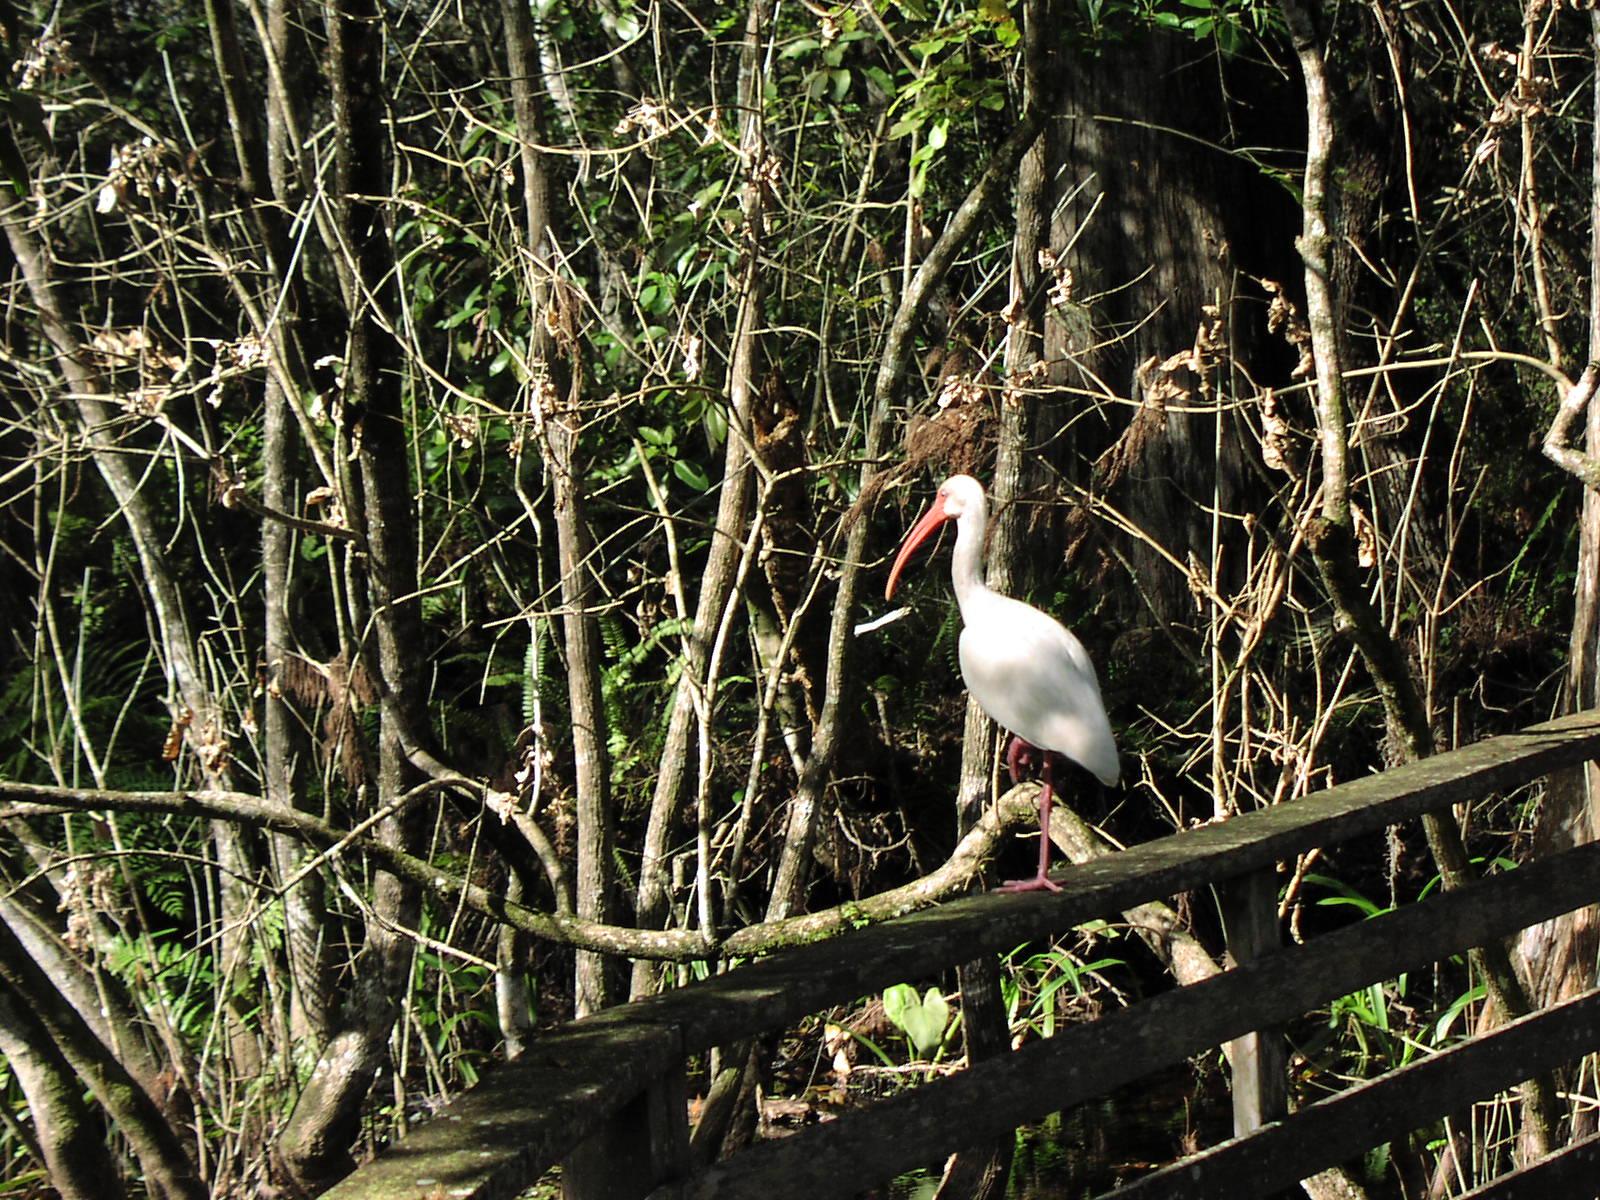 Ibis at Corkscew Swamp Sanctuary Naples FL